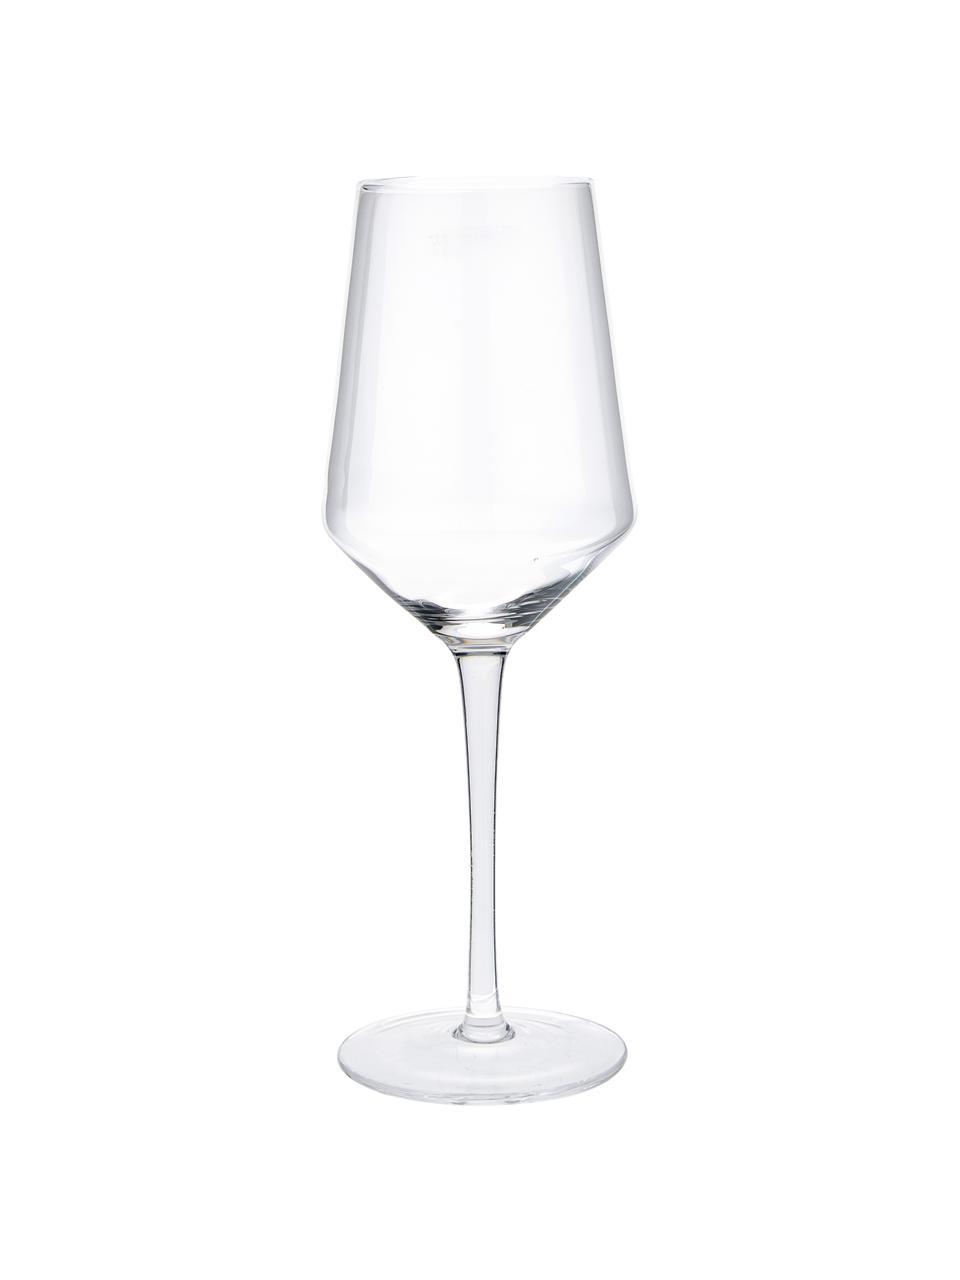 Mondgeblazen witte wijnglazen Ays, 4 stuks, Glas, Transparant, Ø 6 x H 24 cm